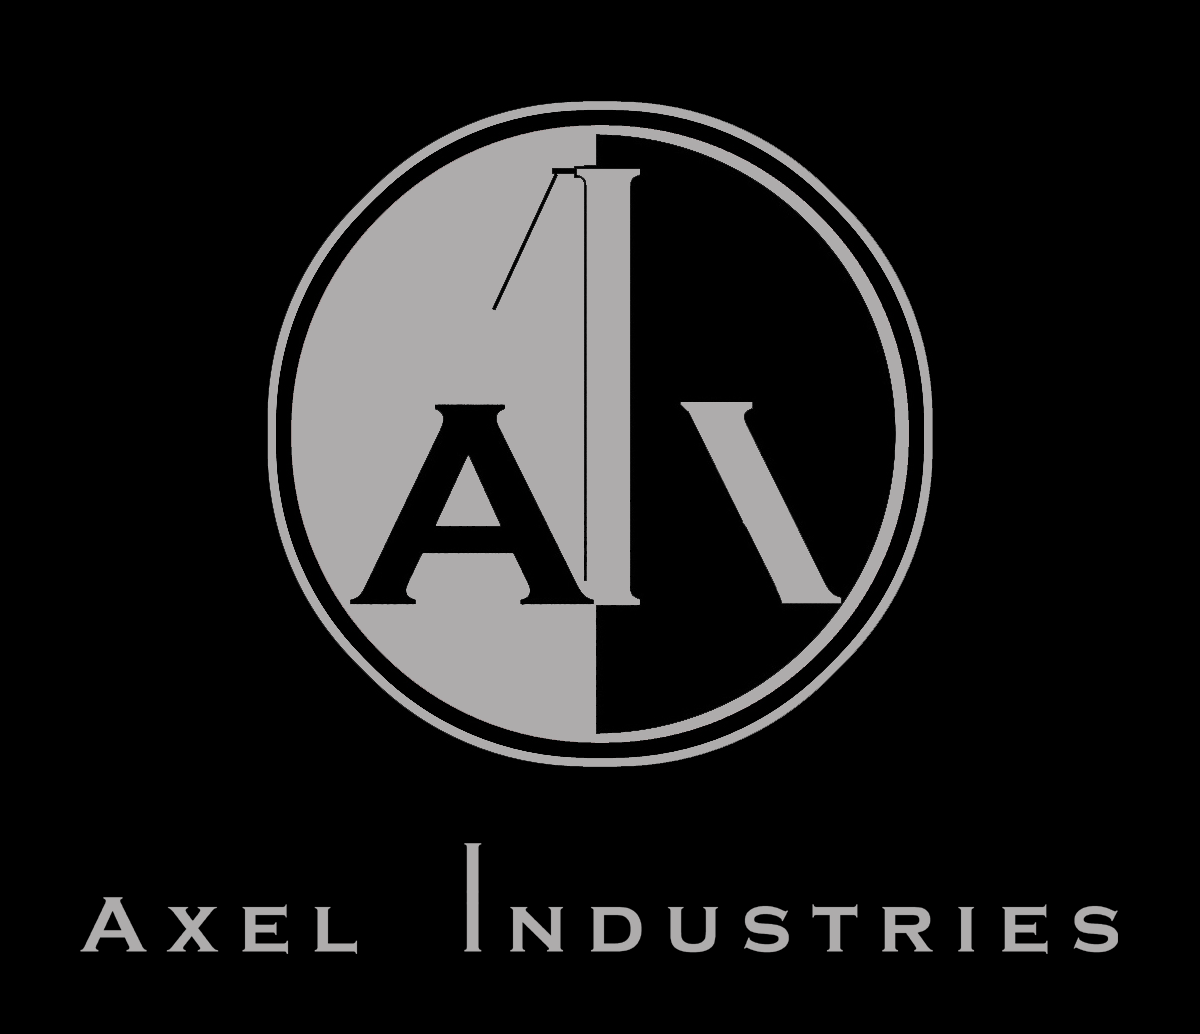 Axel Industries